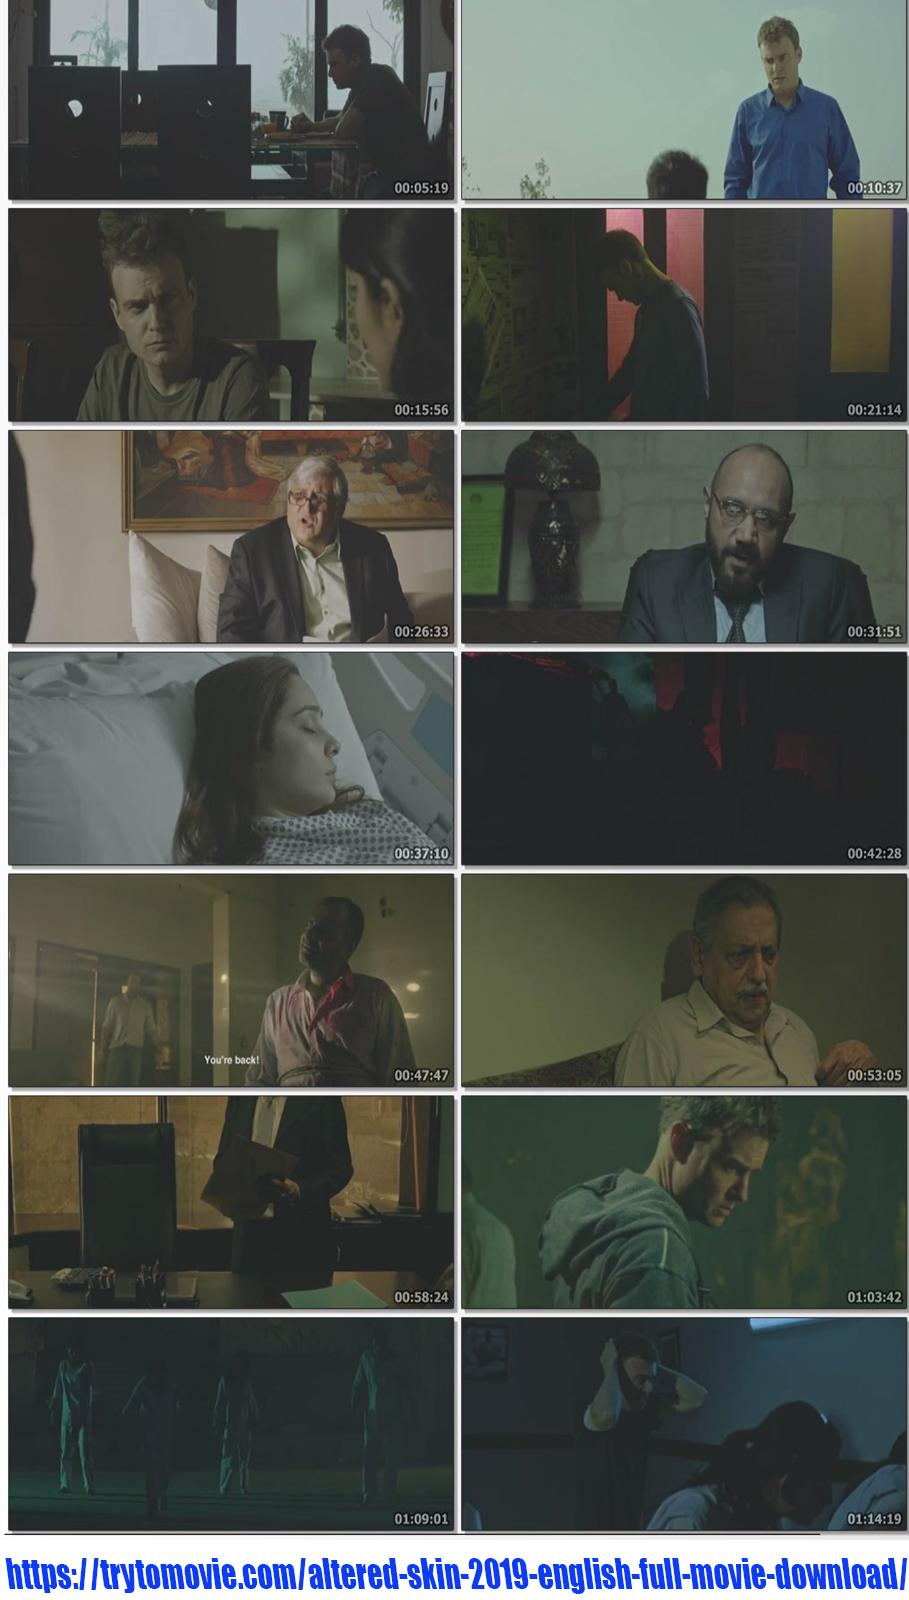 Altered Skin 2019 Full Movie Screenshot